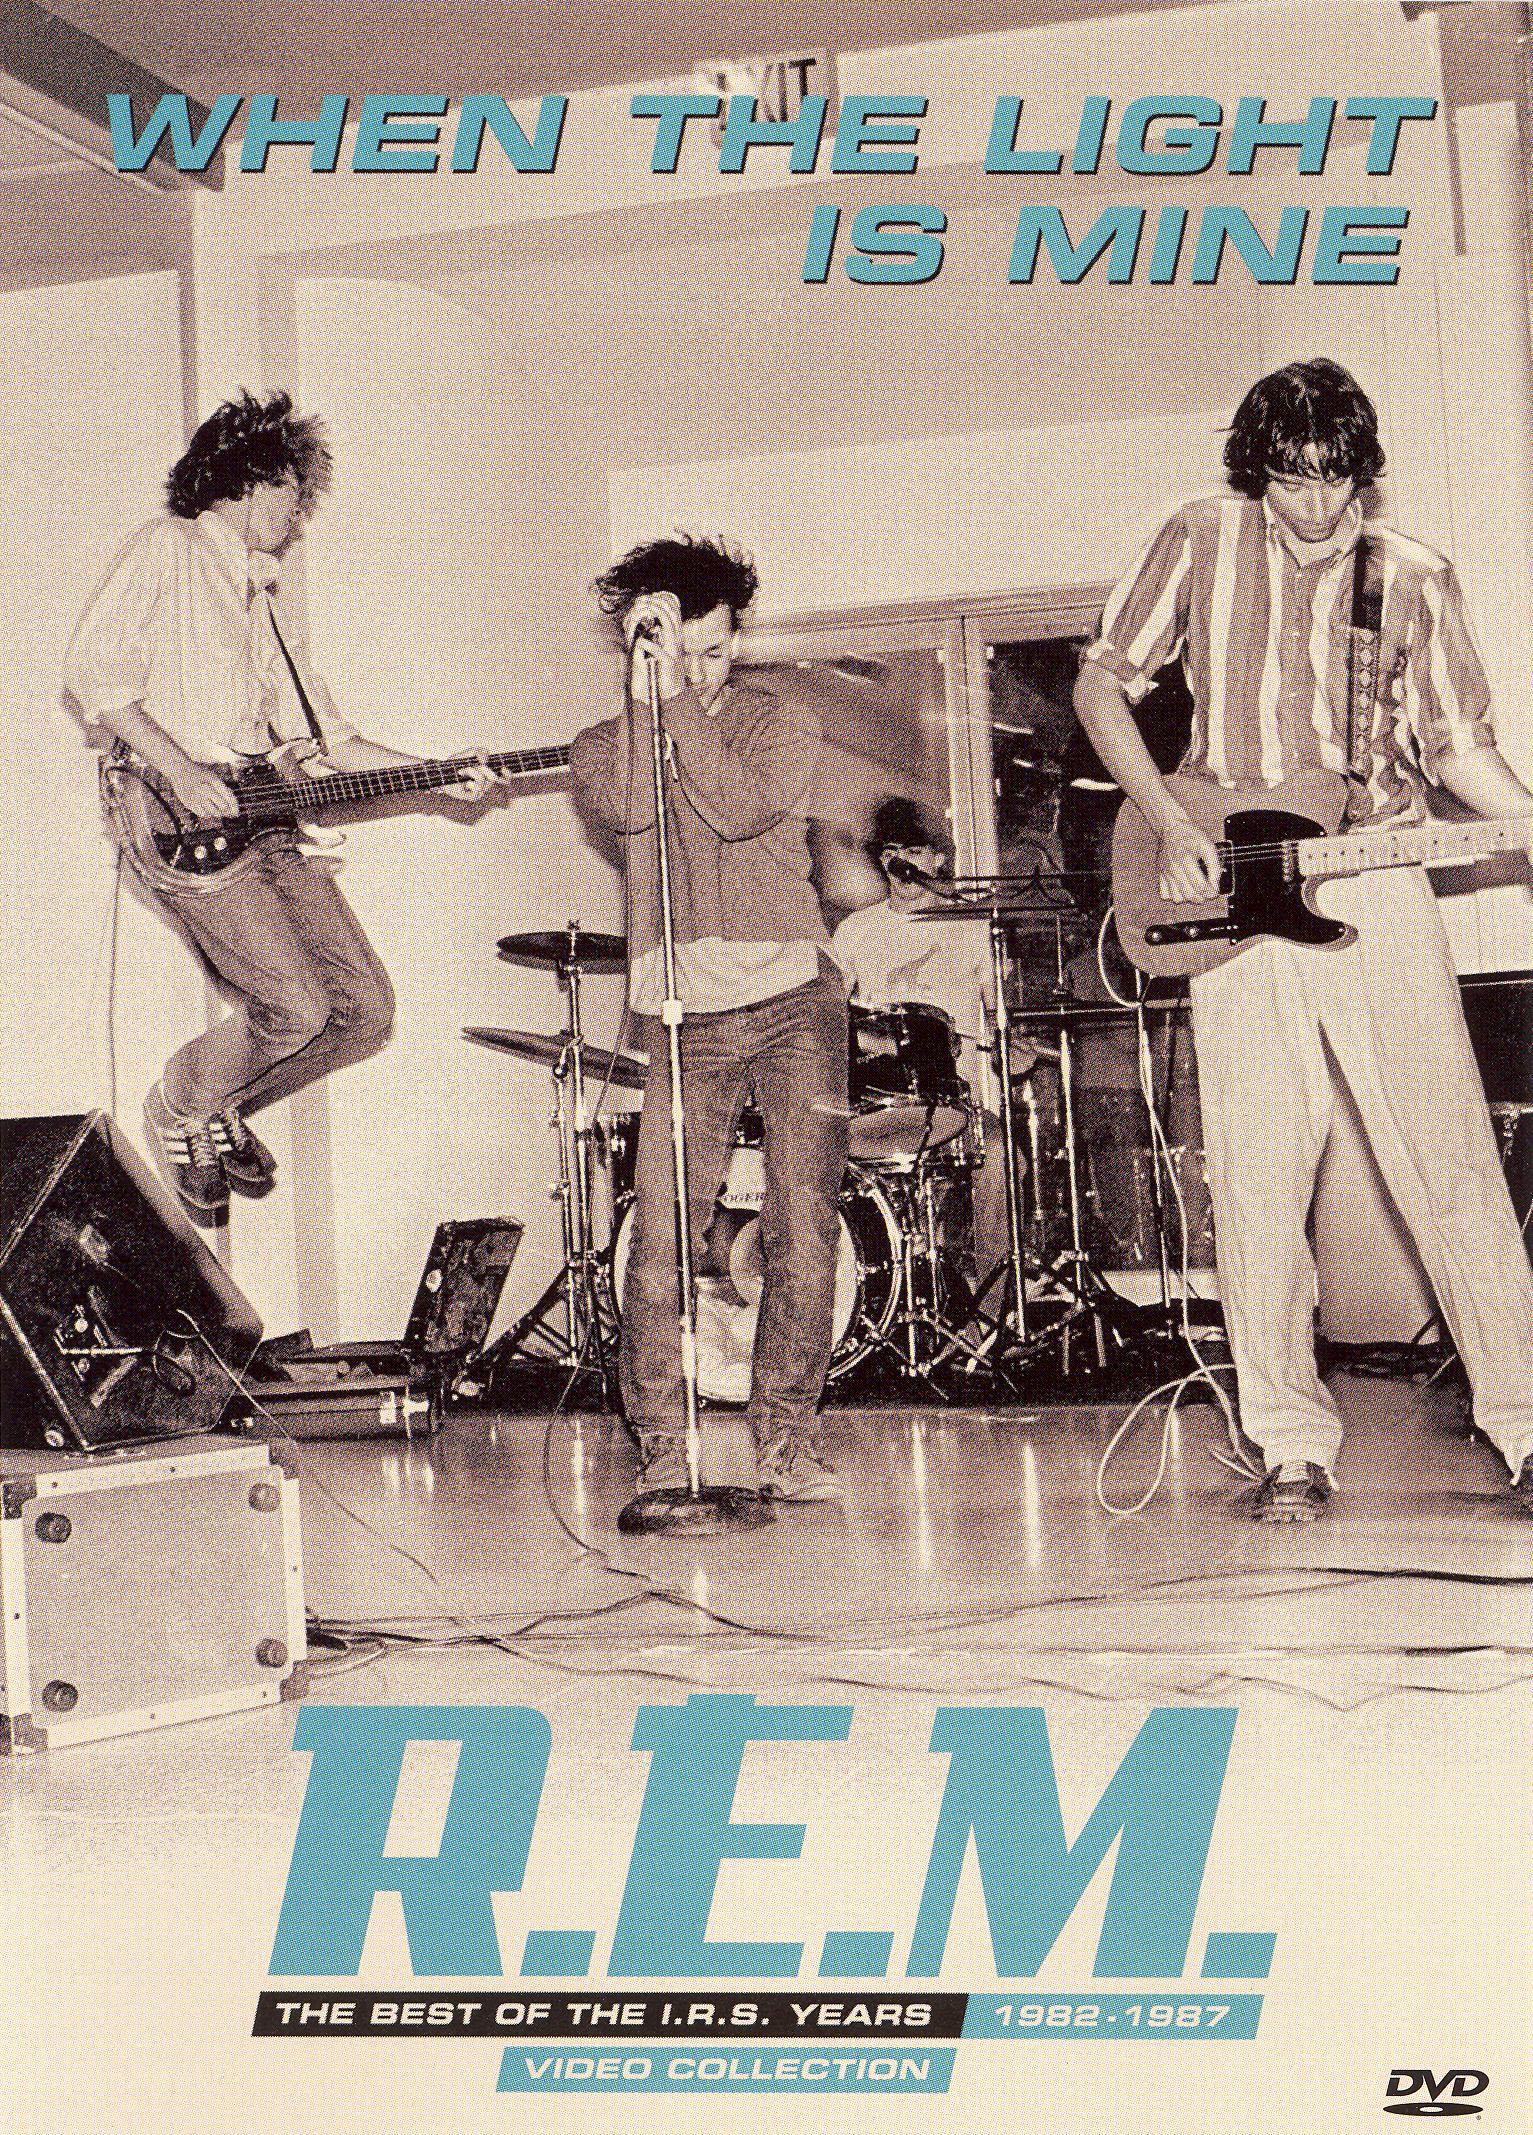 R.E.M.: And I Feel Fine - Best of the I.R.S. Years 1982-1987